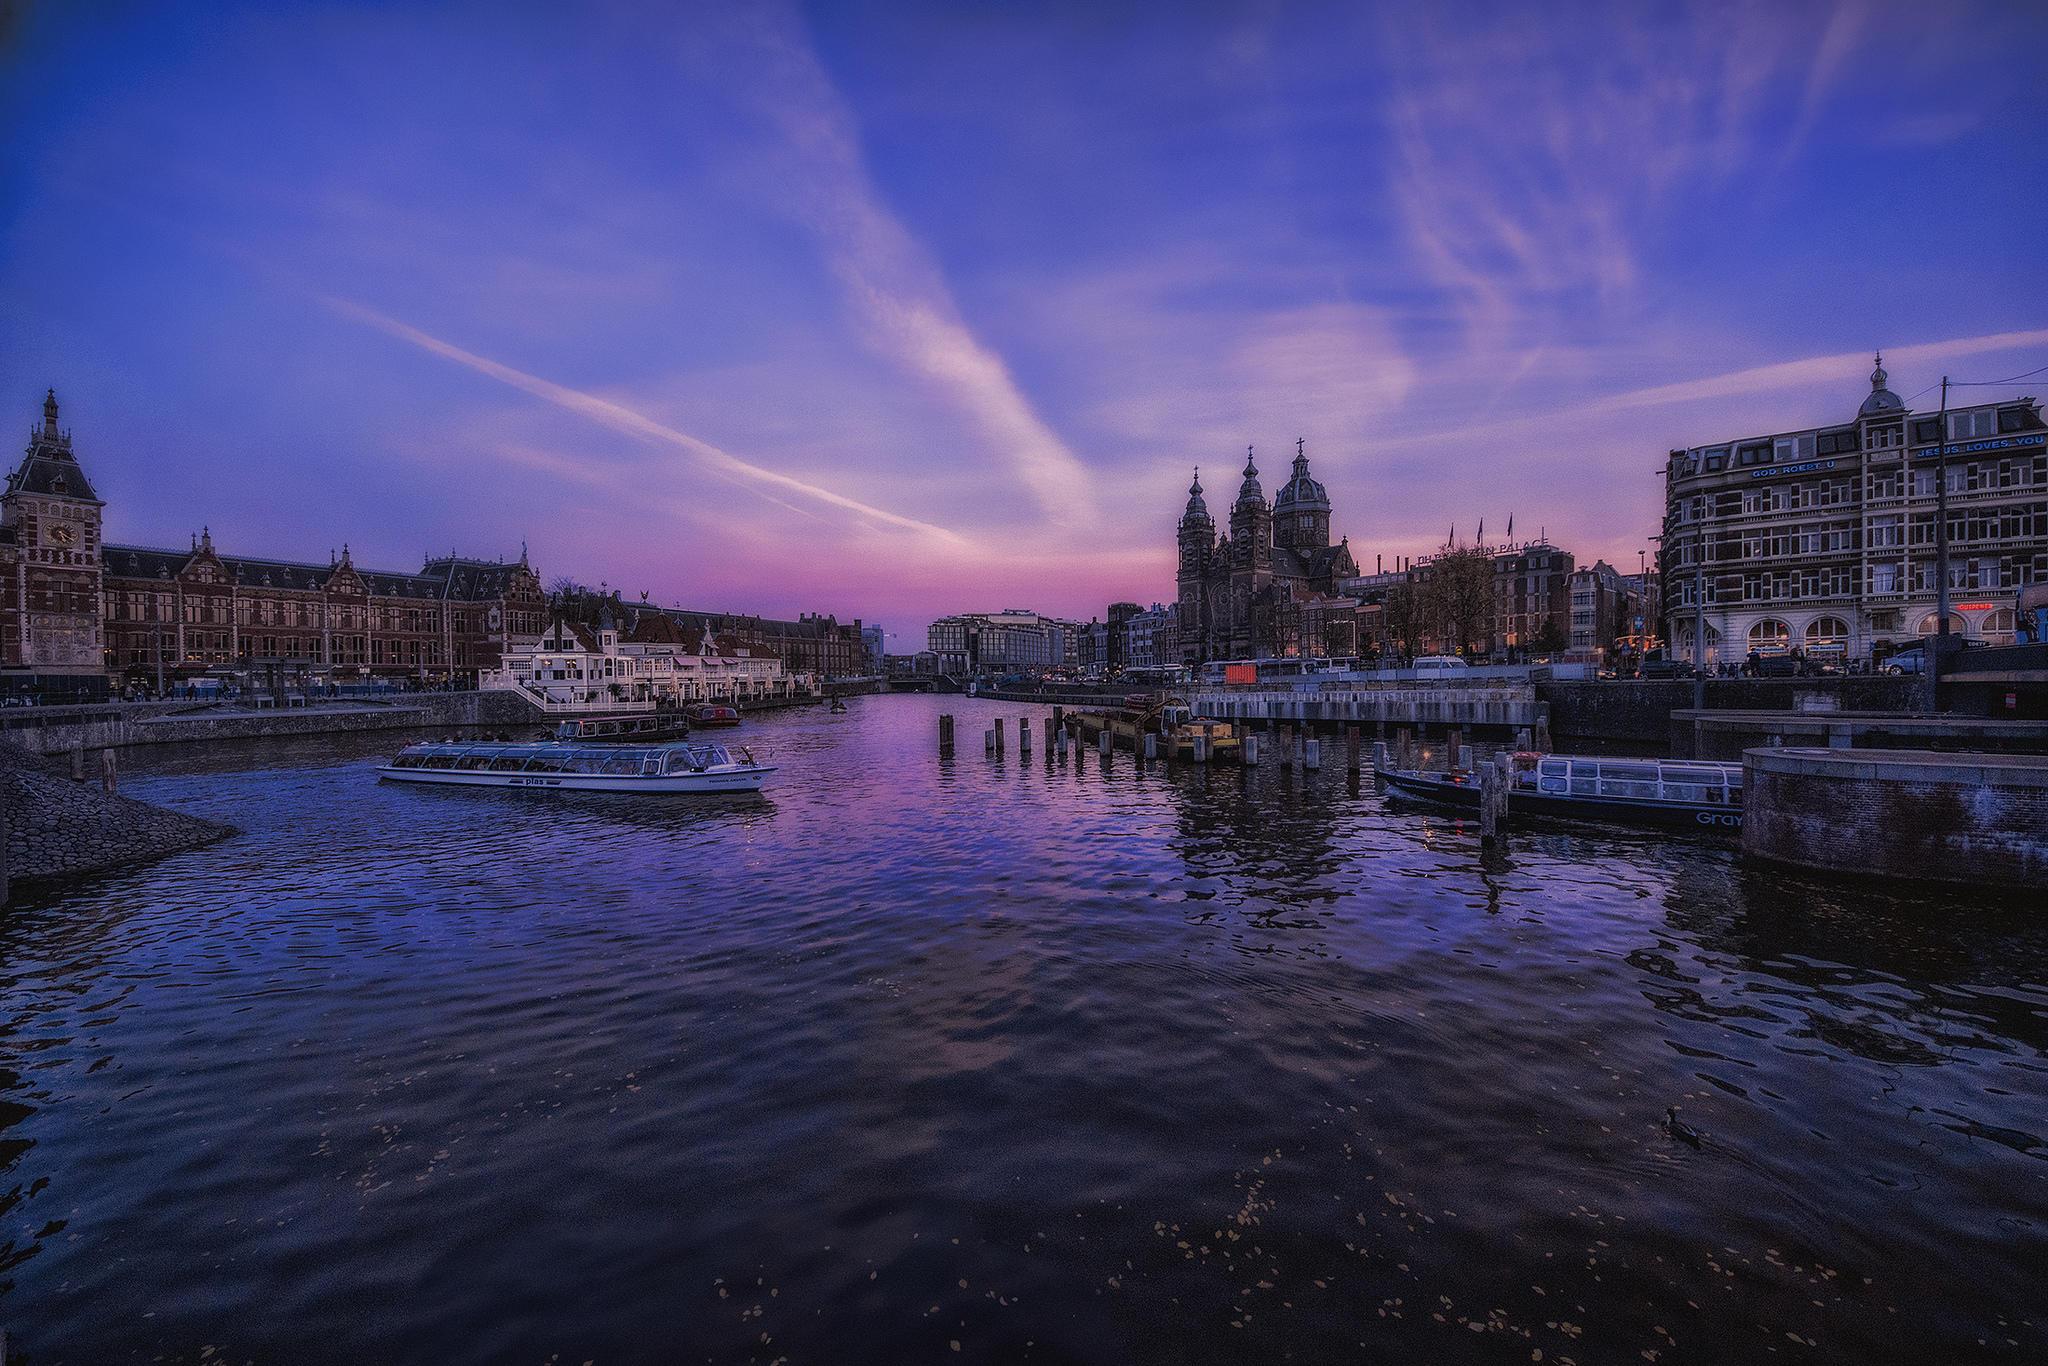 Обои амстердам нидерланды  раздел Природа размер